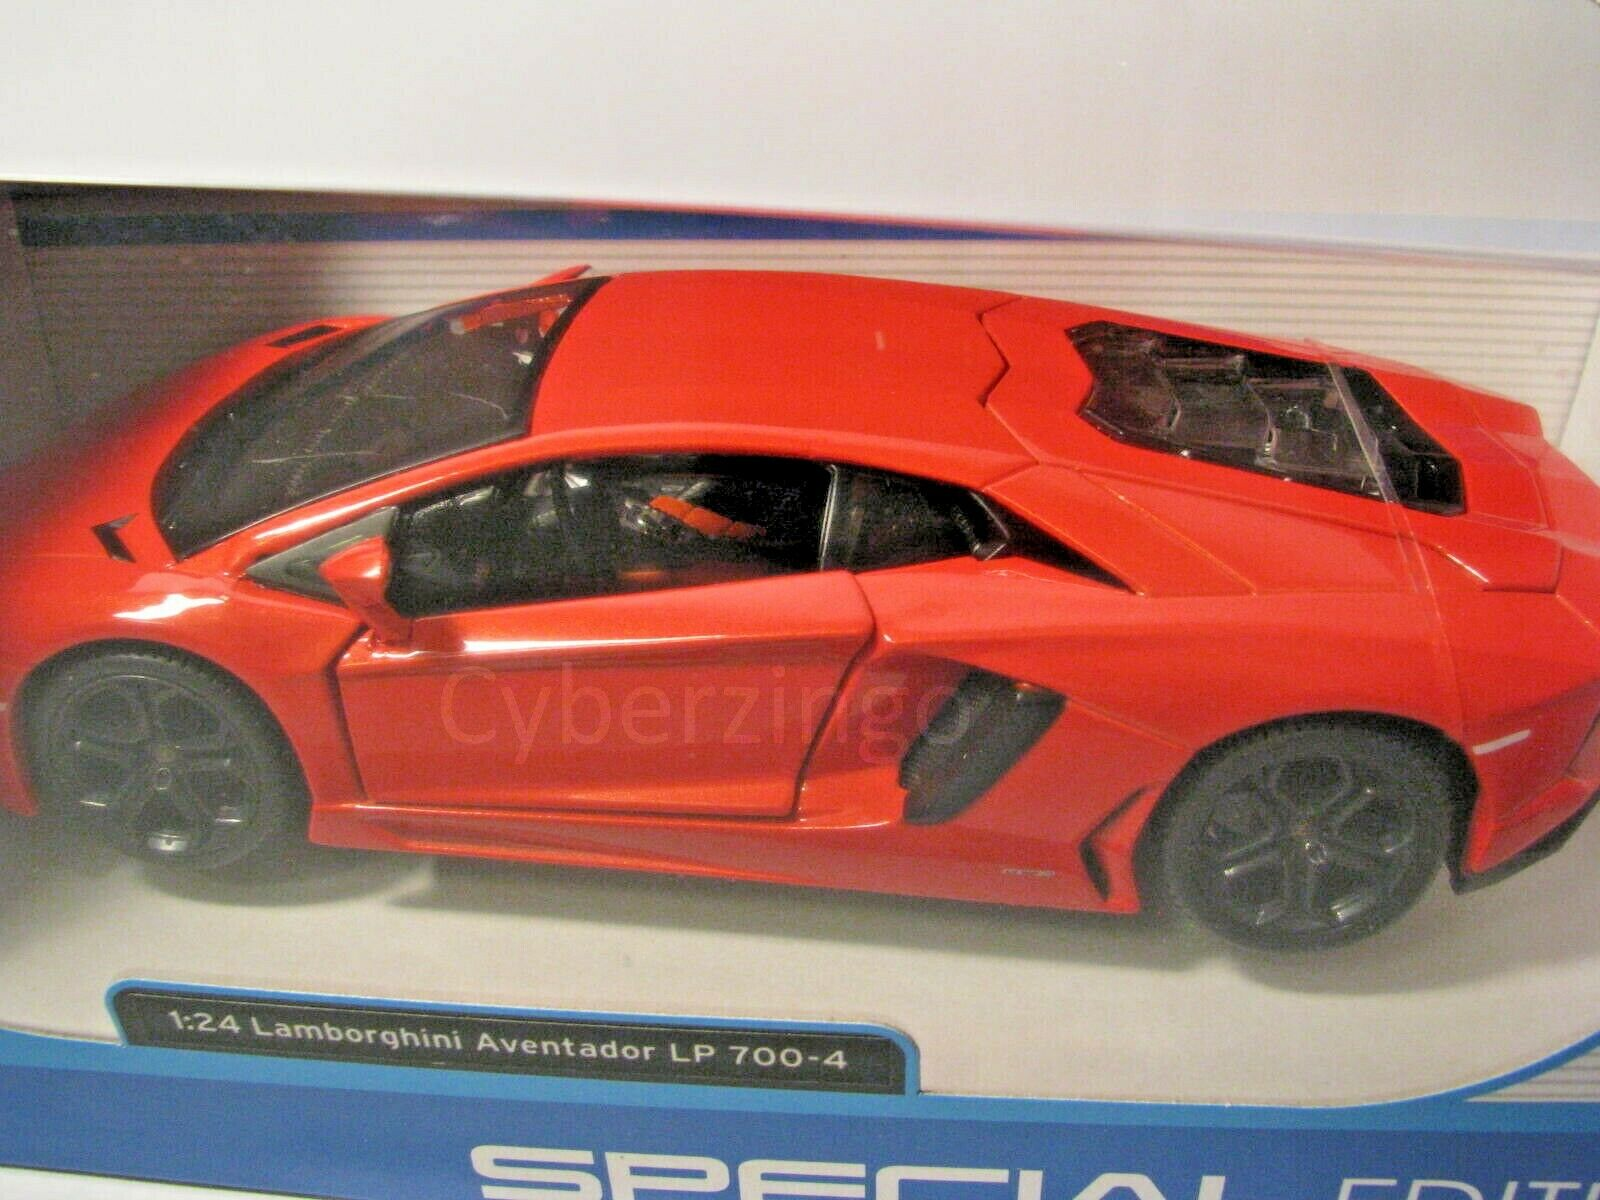 Lamborghini Aventador lp700-4 Coupe Orange 2,4 GHz RC funk auto con iluminación u